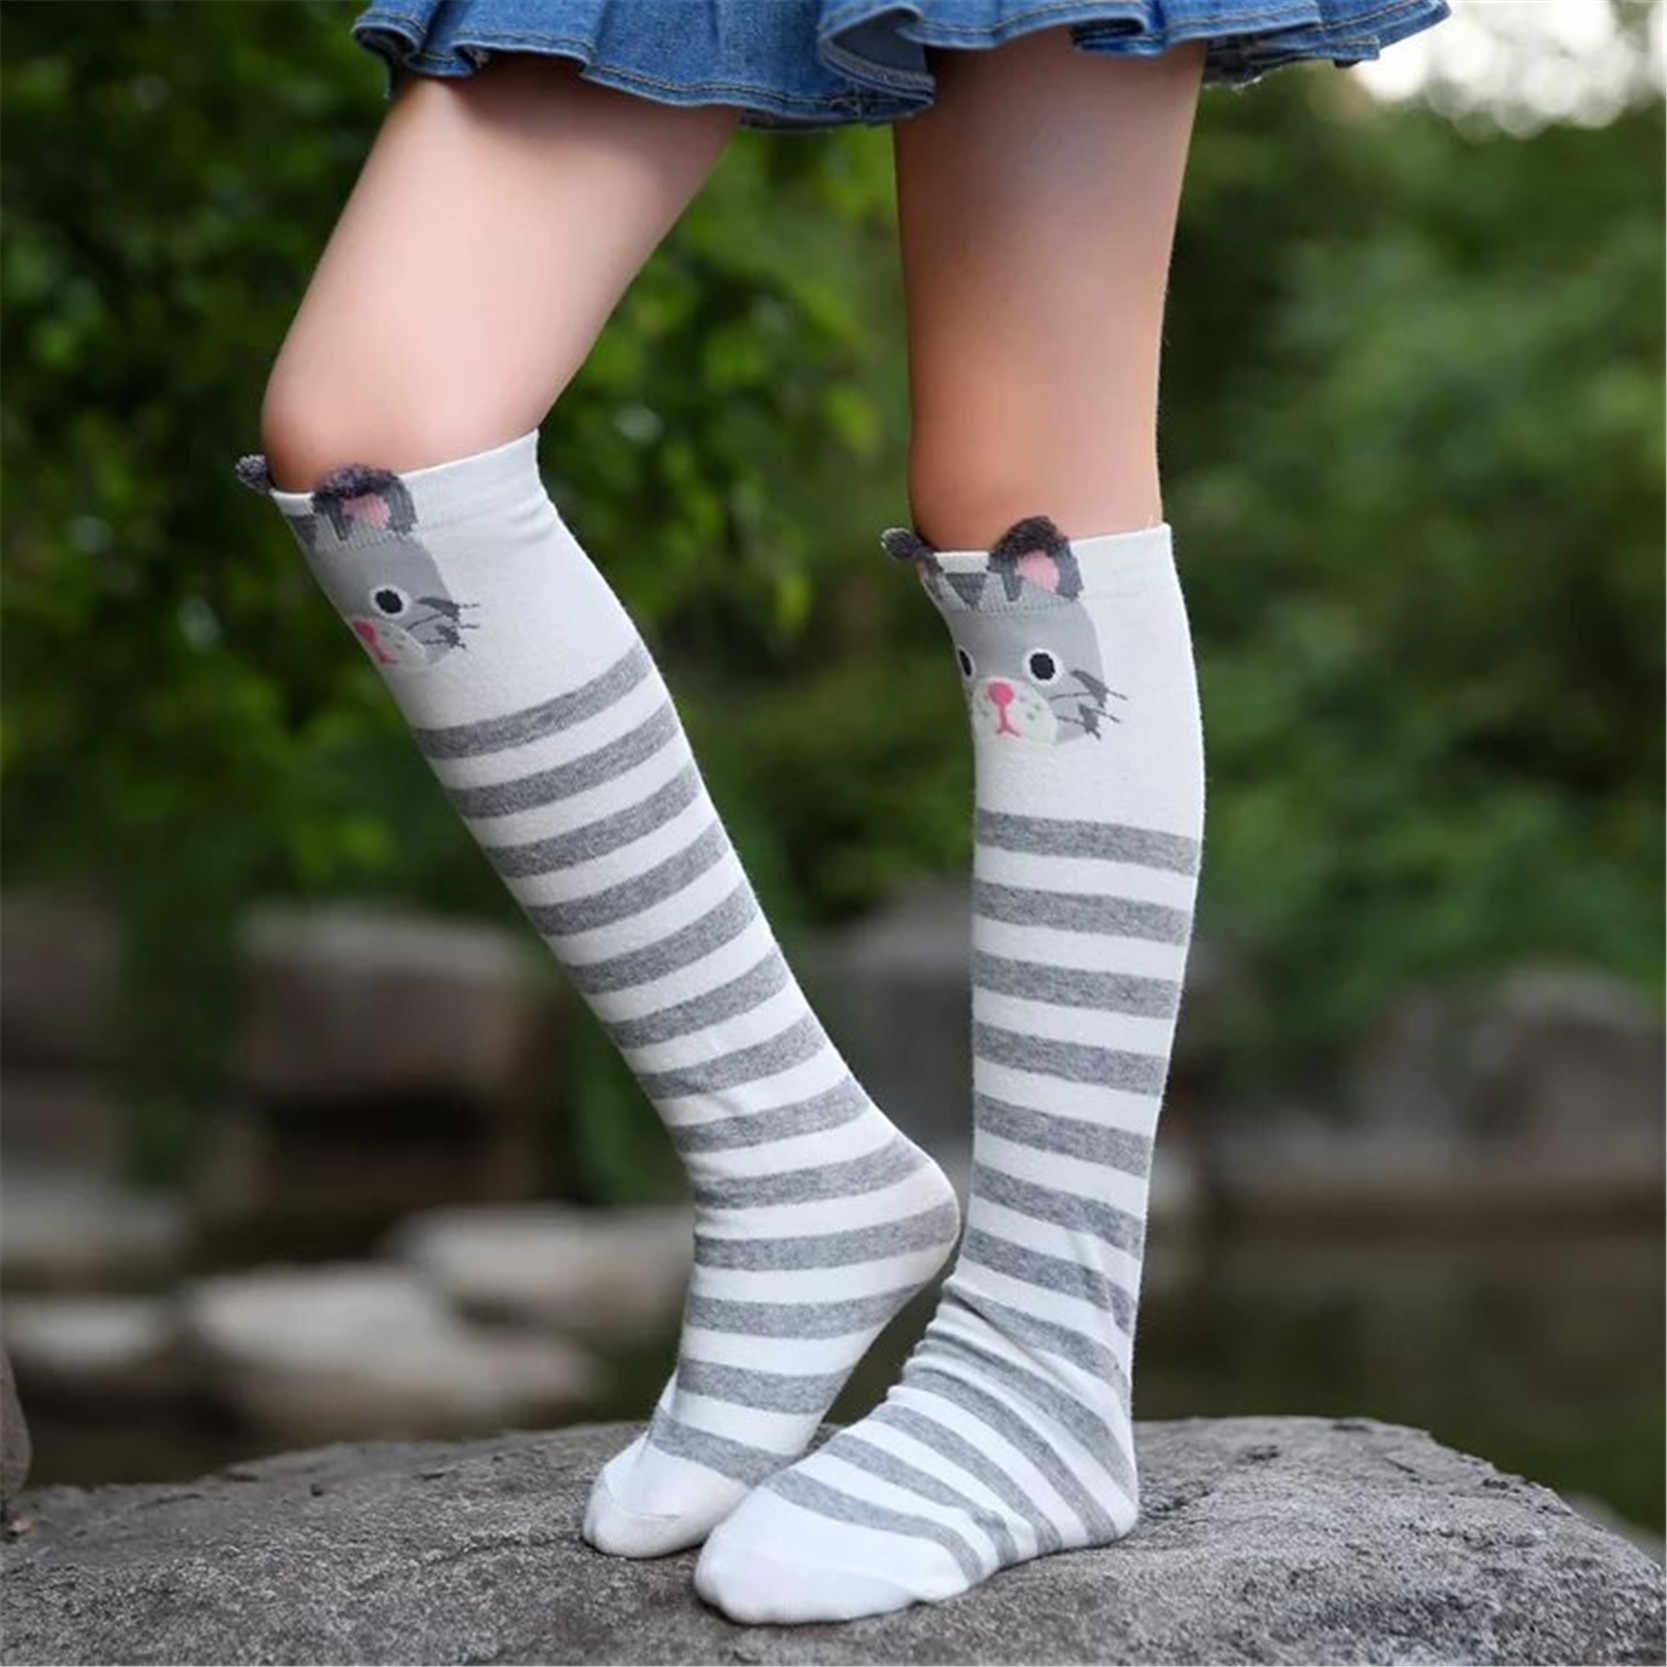 435d04e8b ... Cotton Knee High Socks For Kids Girl Cute Panda Cat Fox Cartoon Long  Socks Children Winter ...